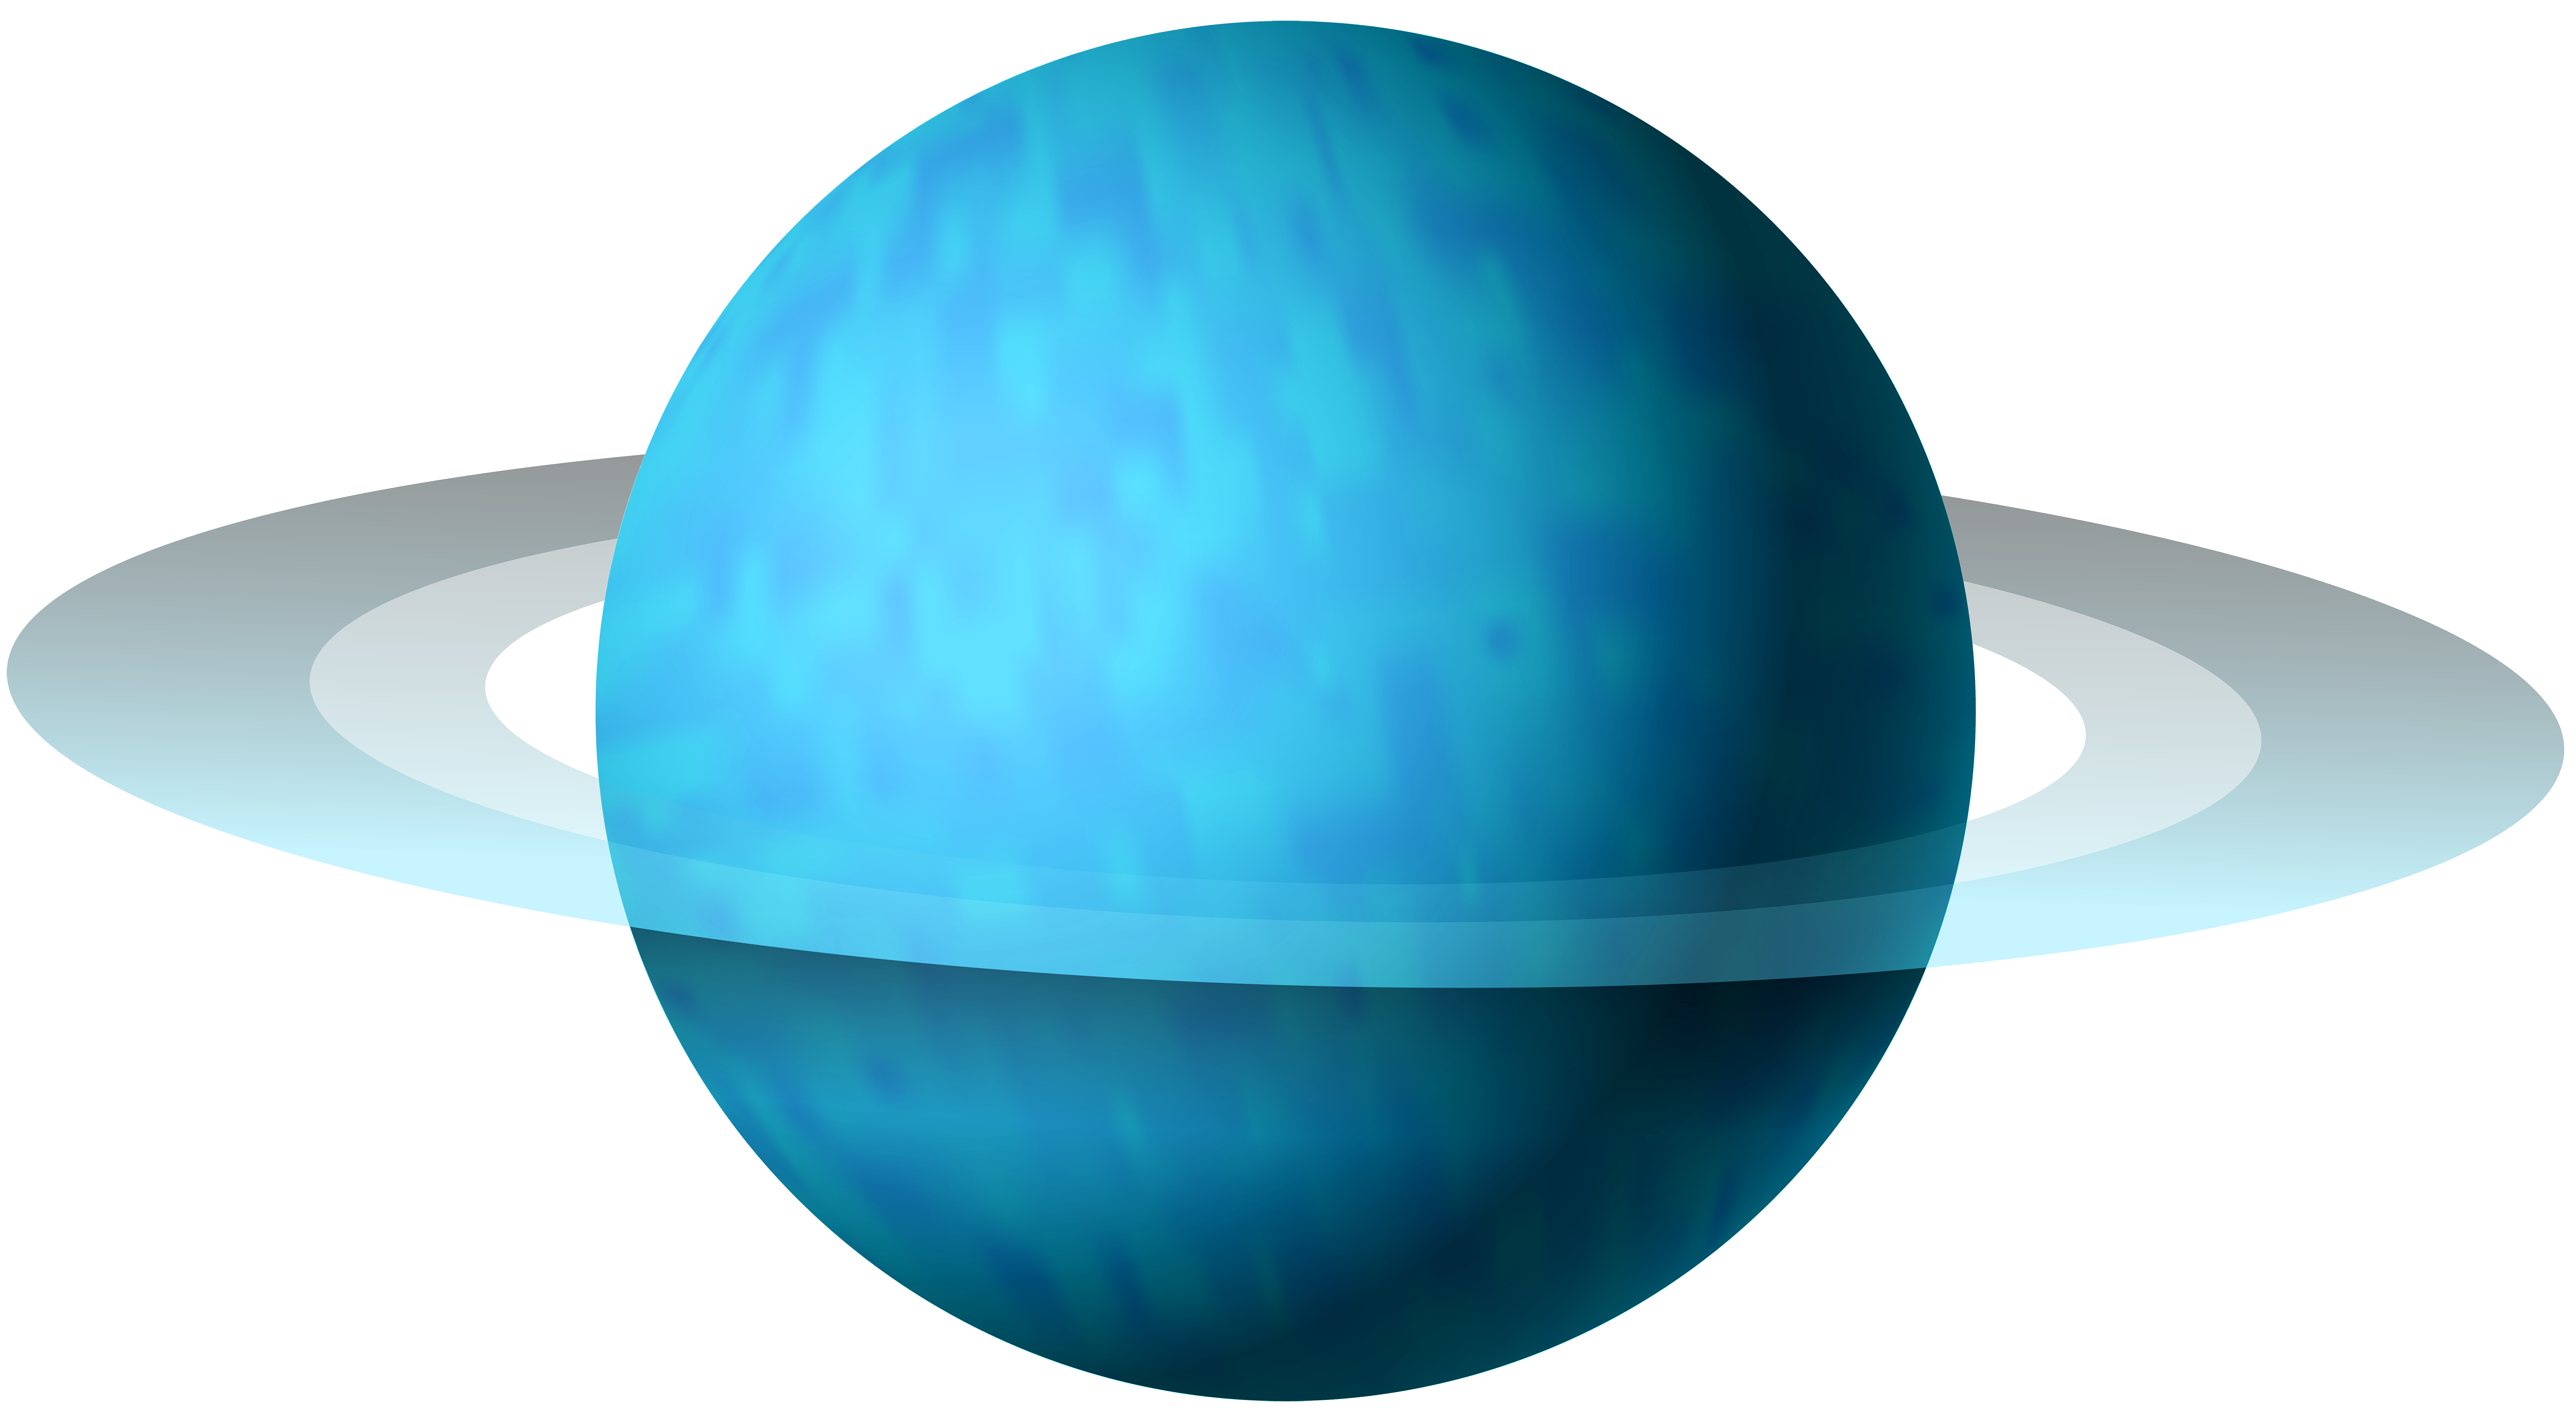 7000x3865 Uranus Png Clip Art